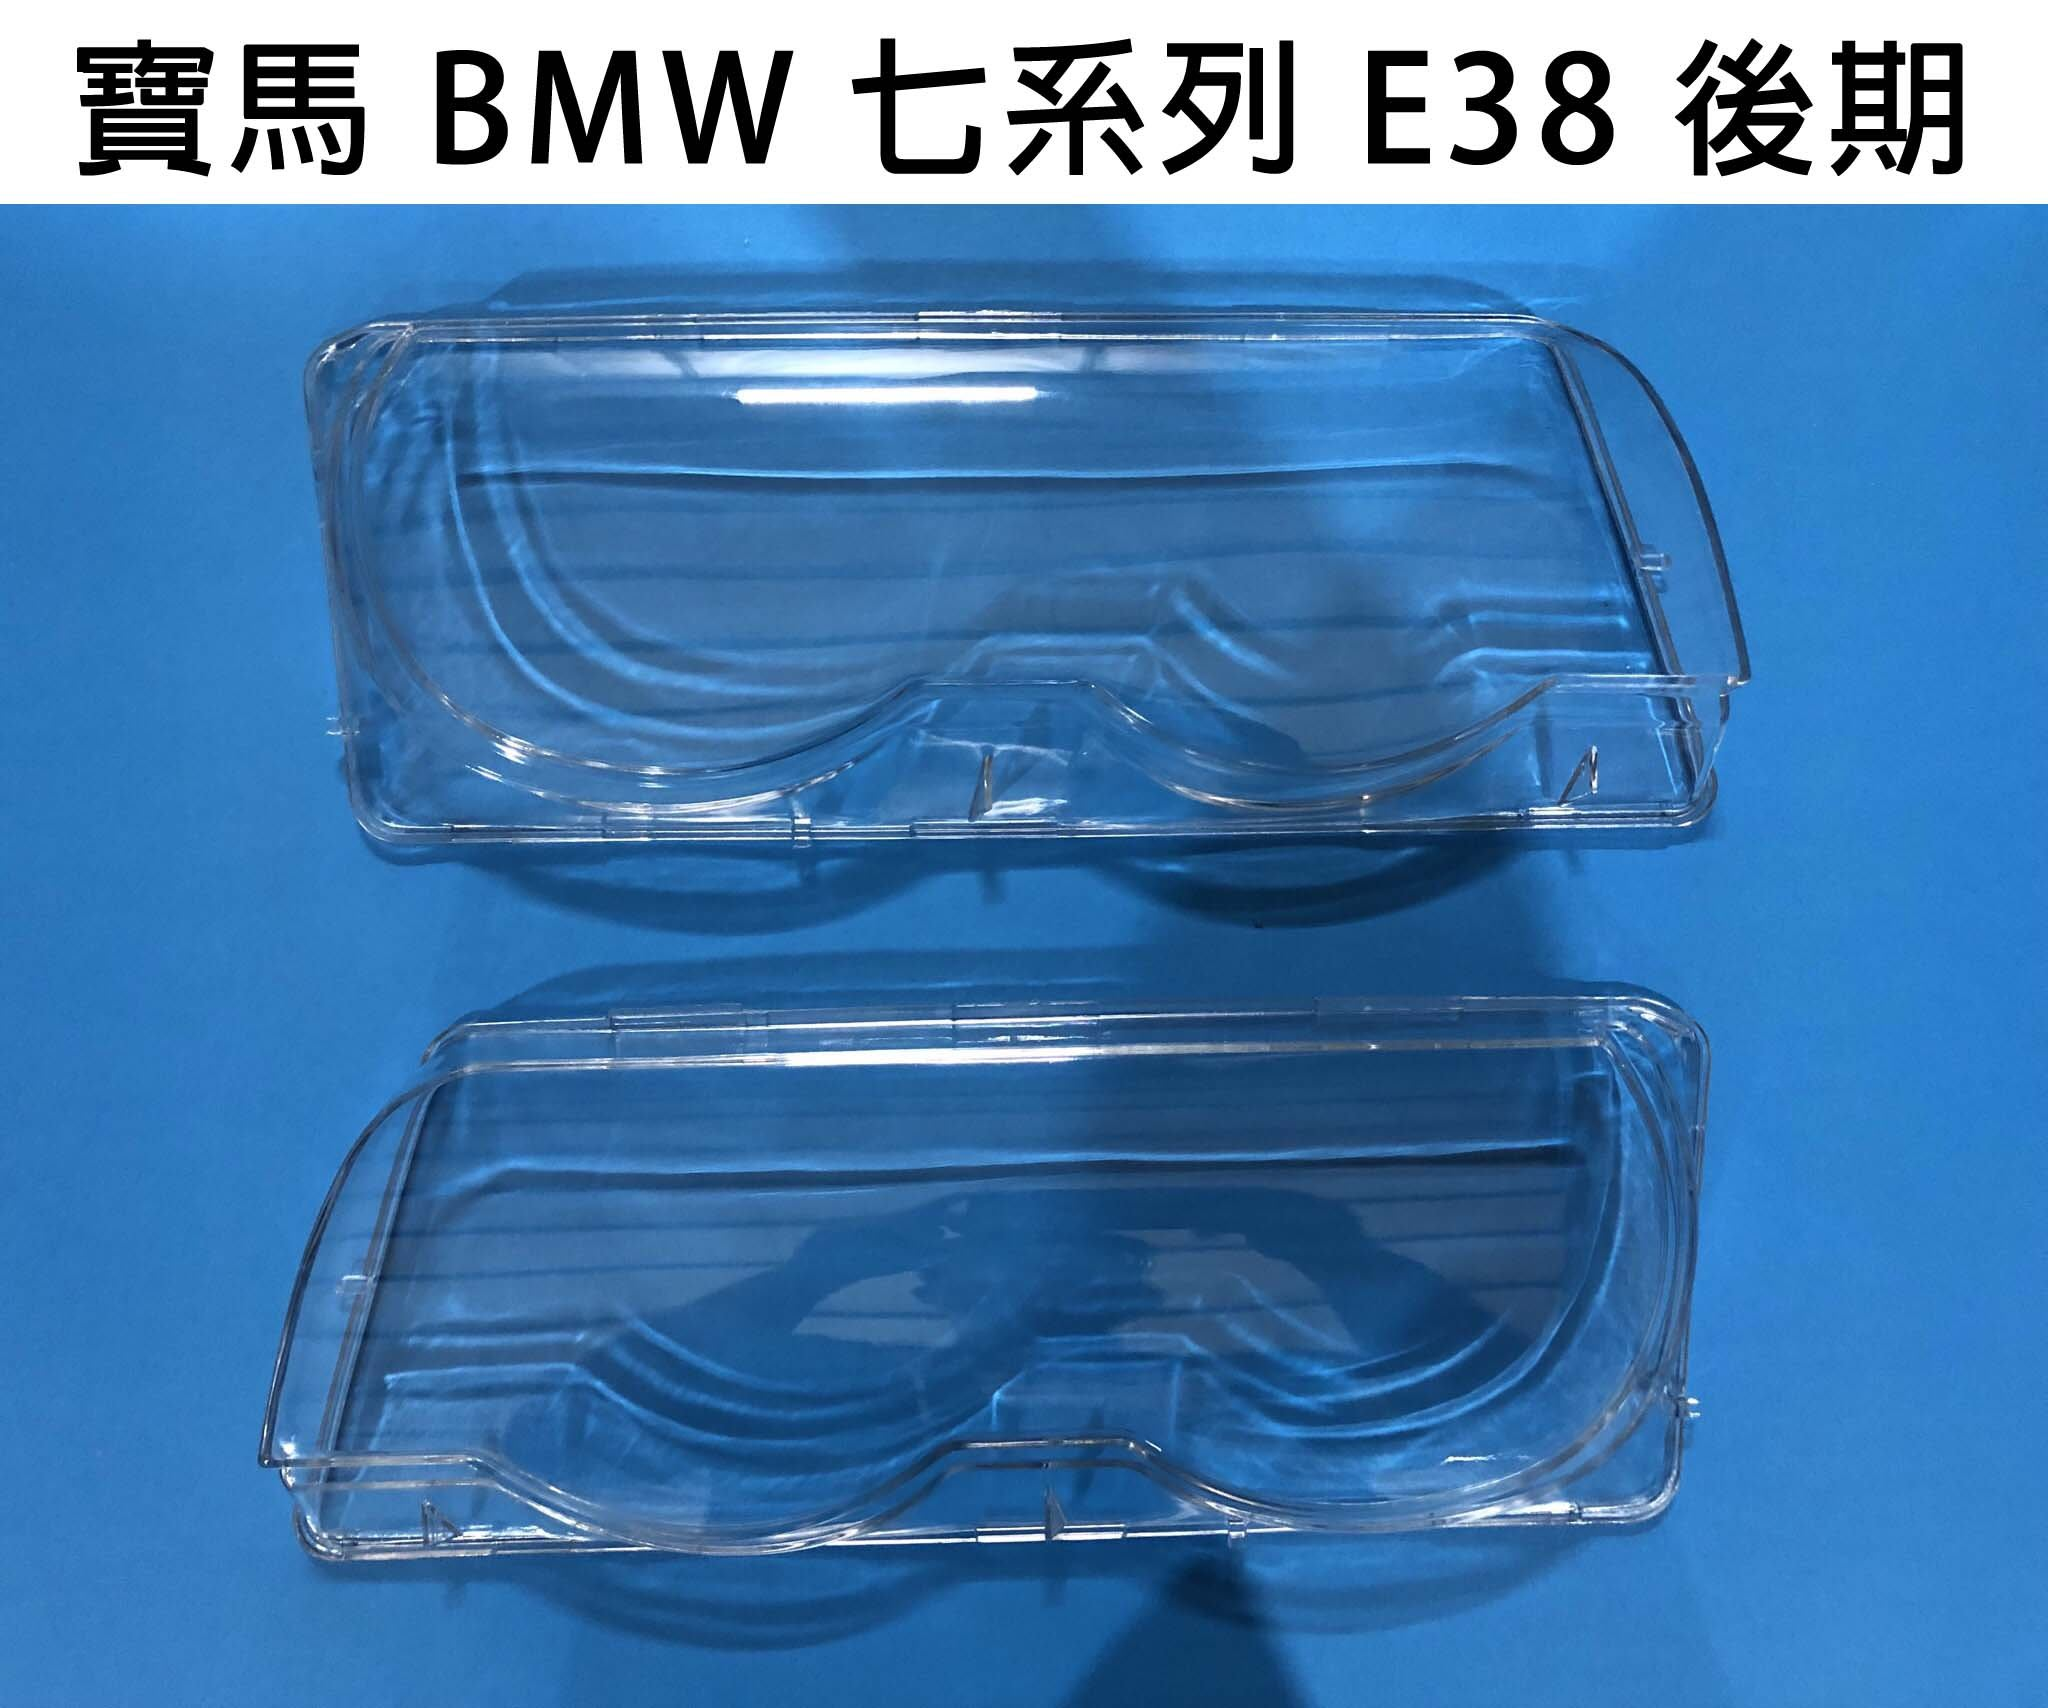 BMW 寶馬汽車專用大燈燈殼 燈罩寶馬 BMW 七系列 E38 後期 98-01適用 車款皆可詢問